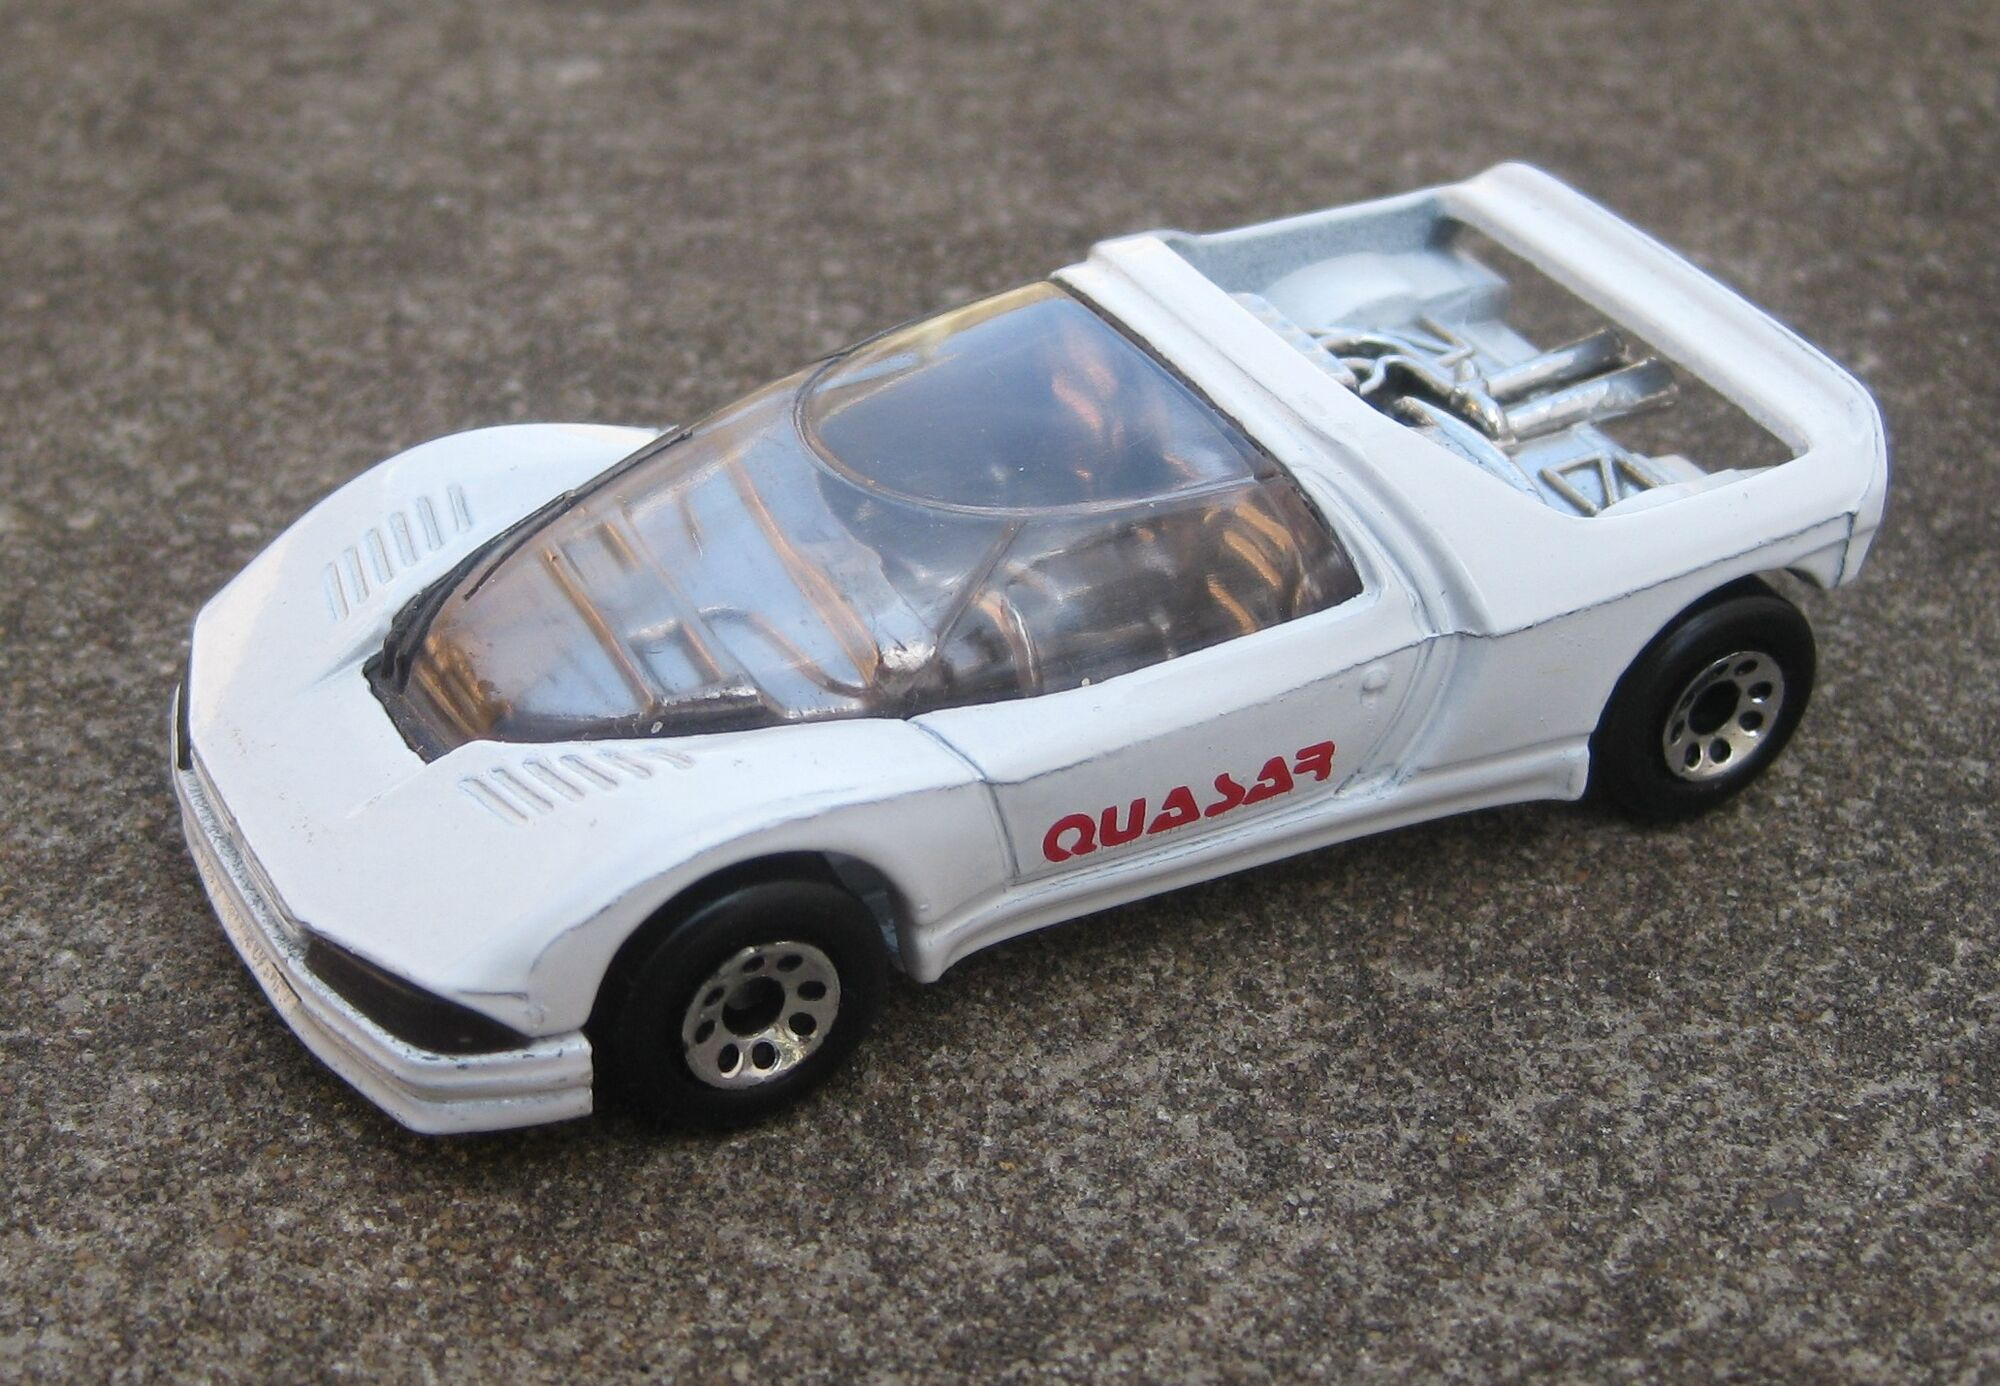 Peugeot Quasar Matchbox Cars Wiki Fandom Powered By Wikia